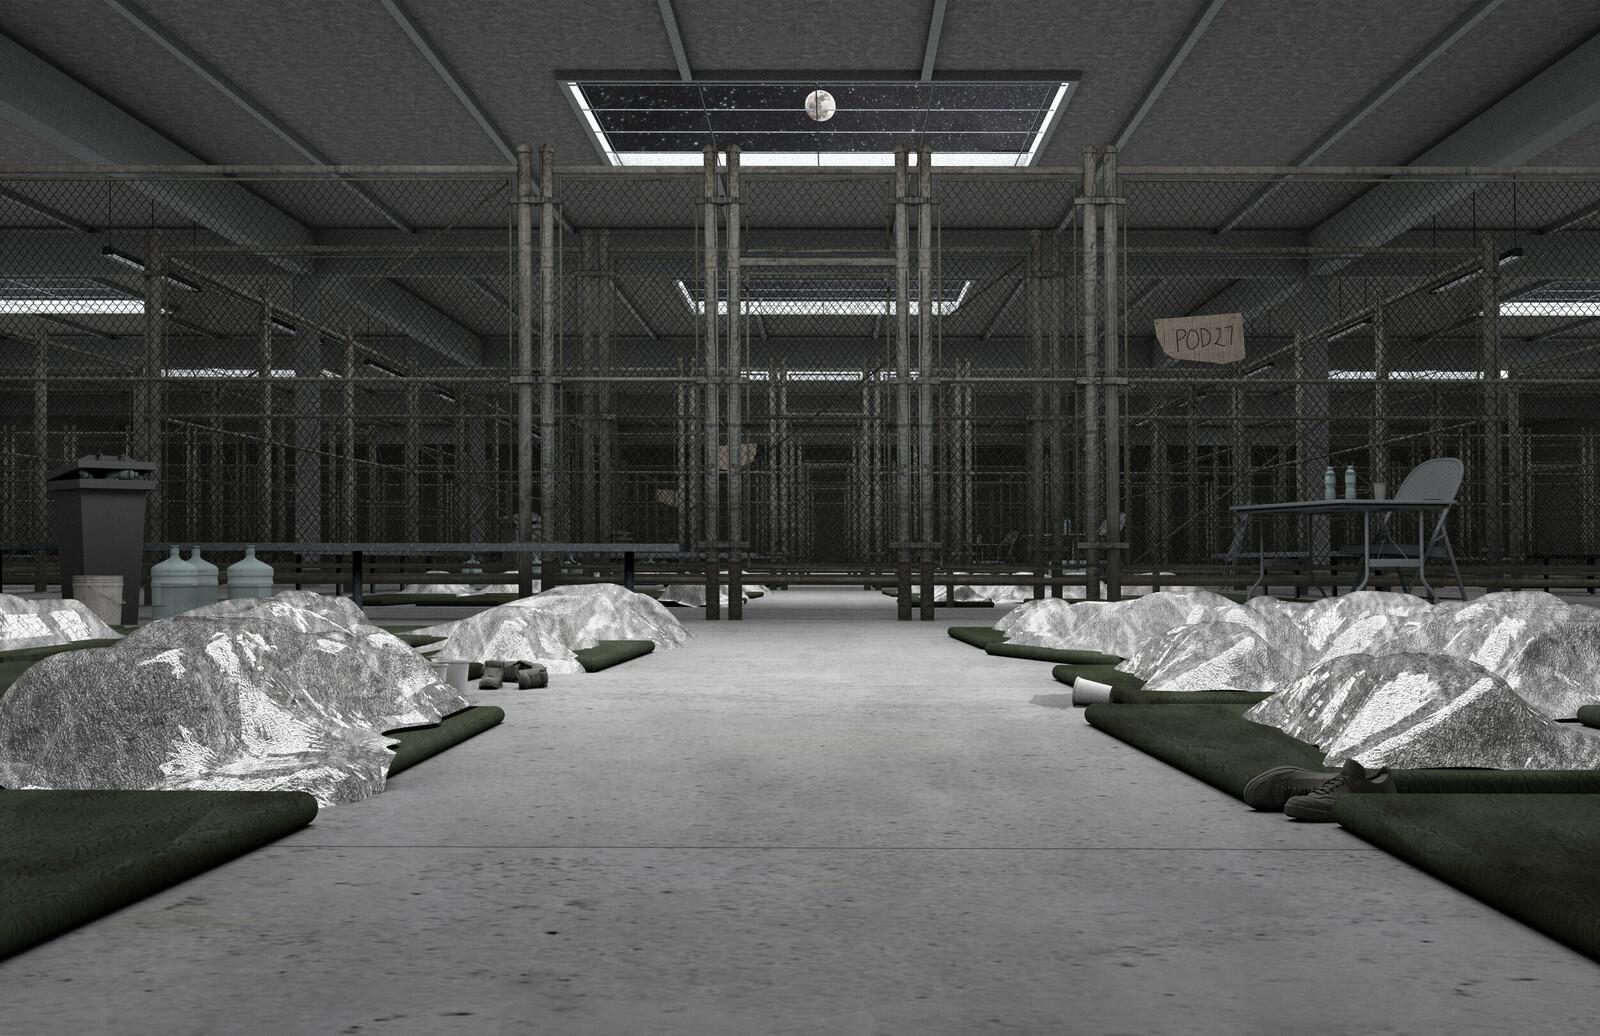 U.S Detention Centers